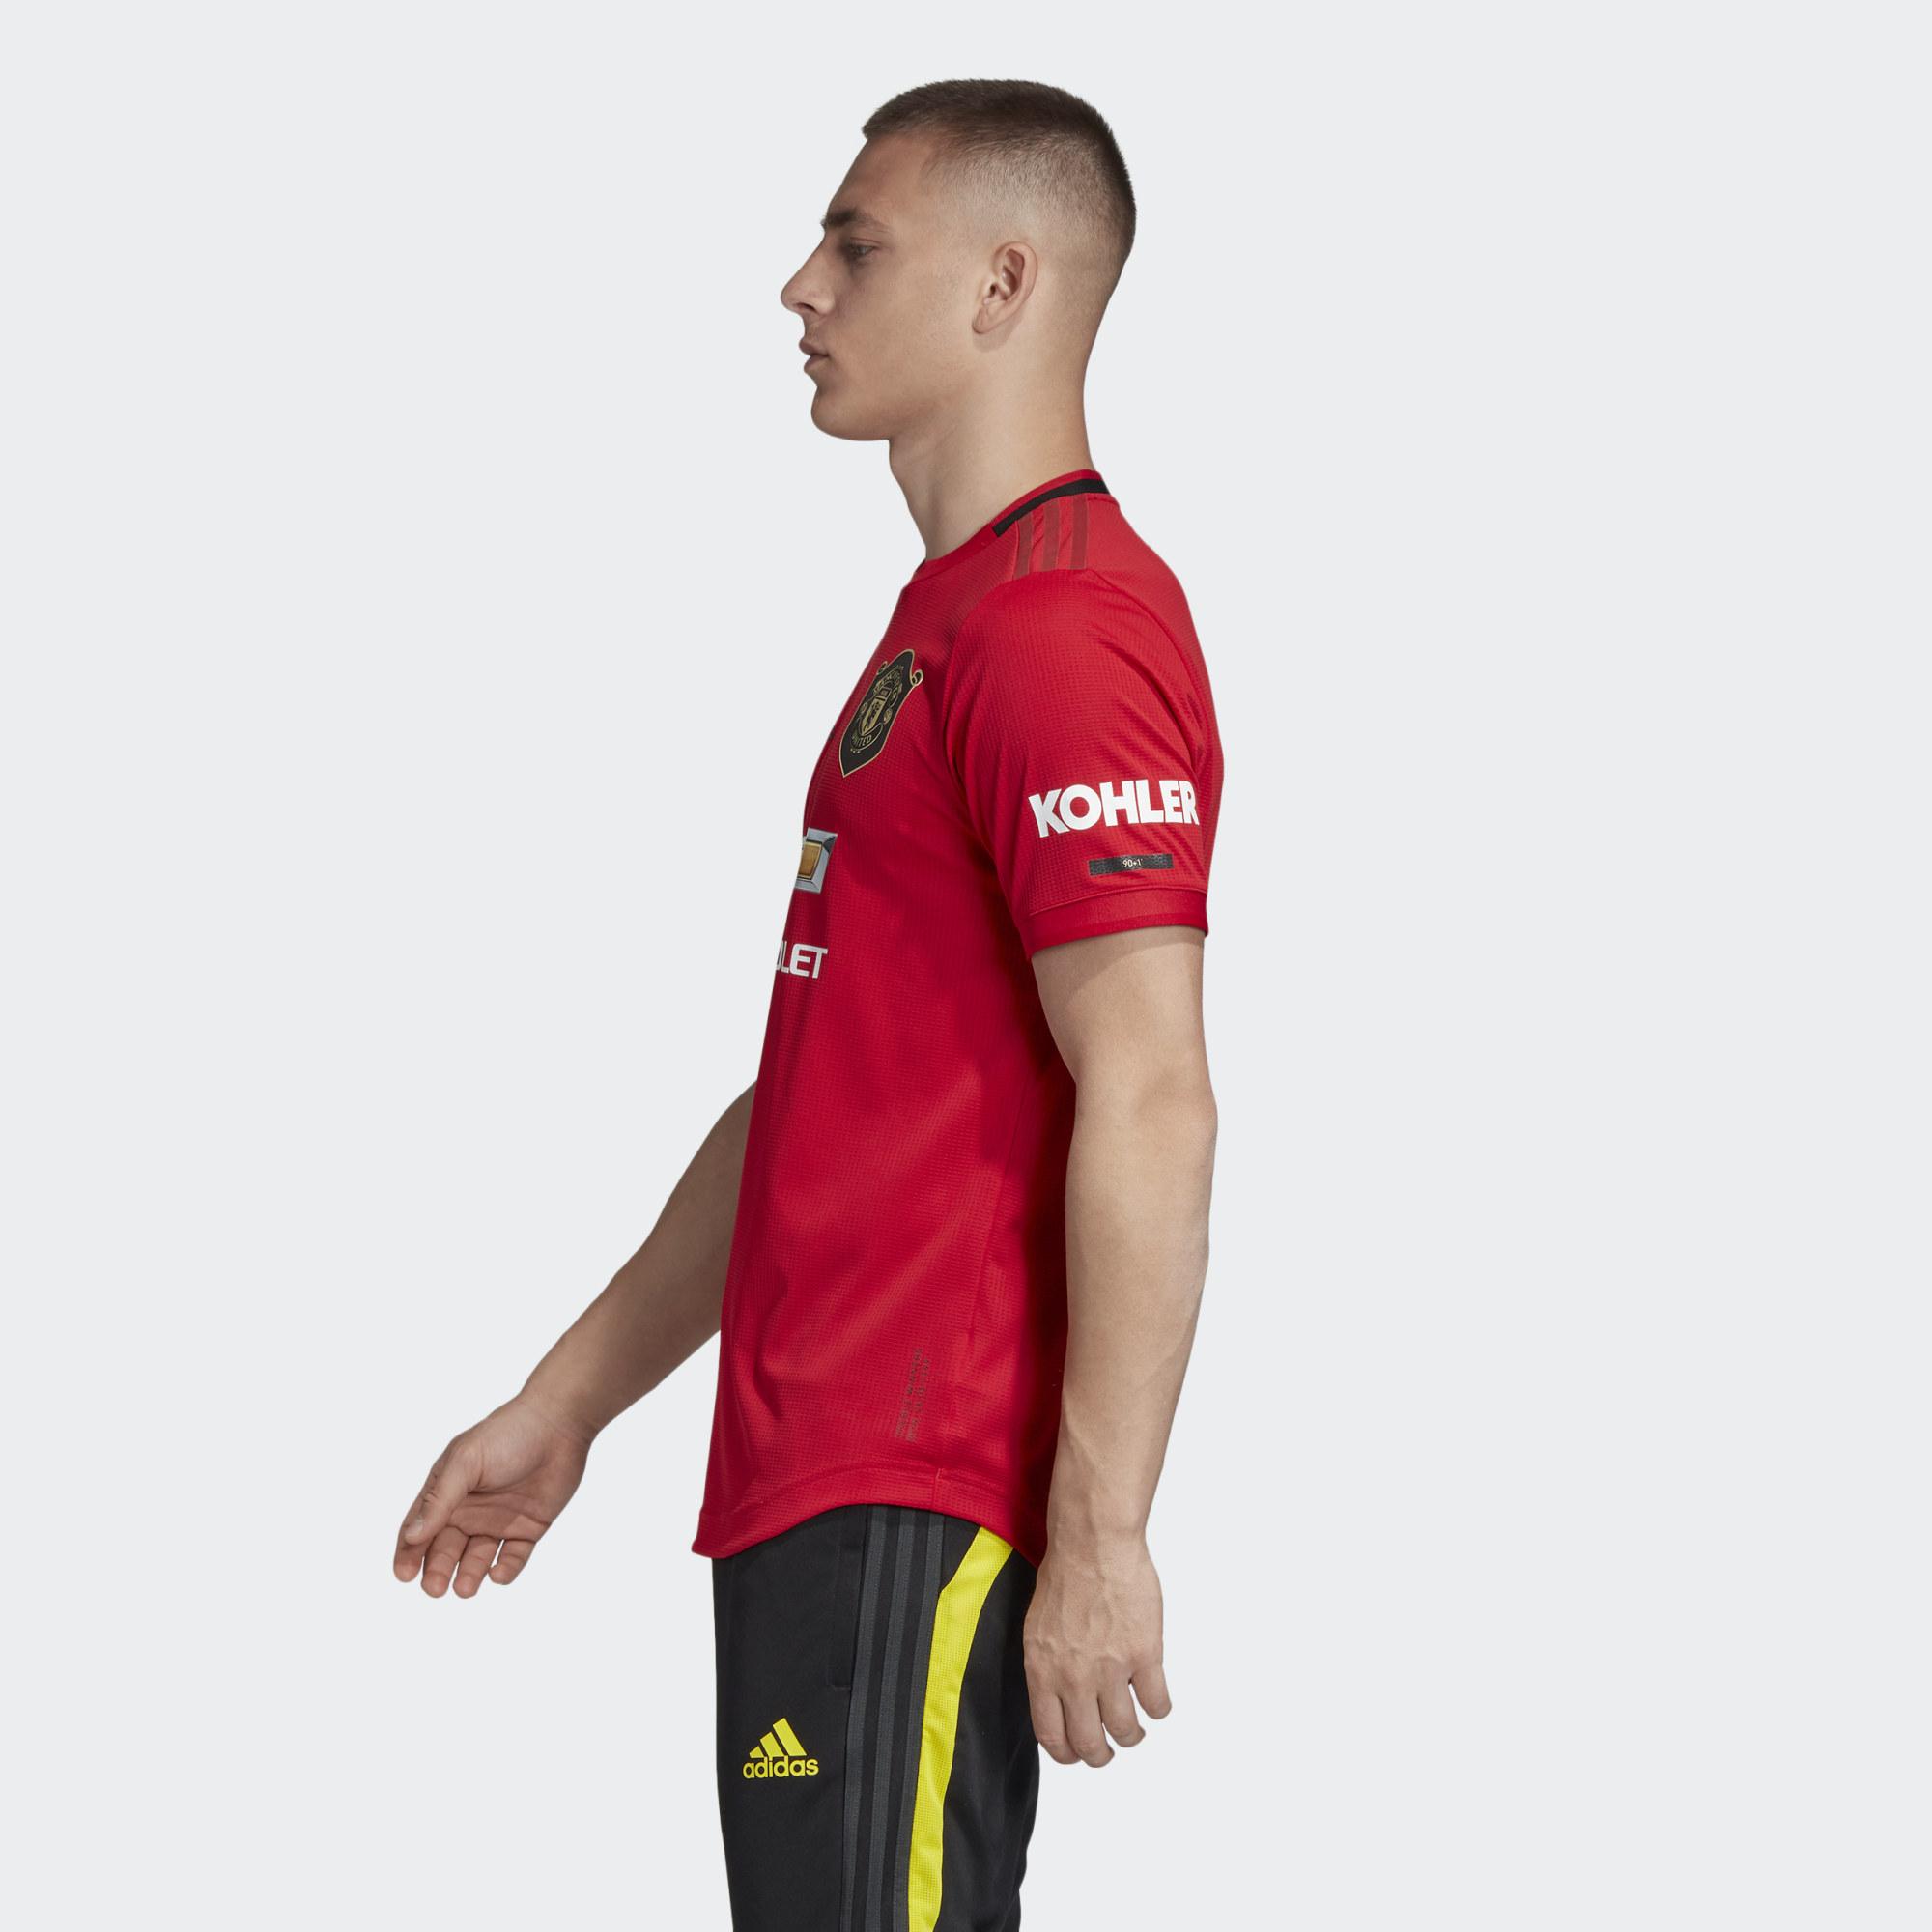 Manchester United 2019-20 Adidas Home Kit | 19/20 Kits